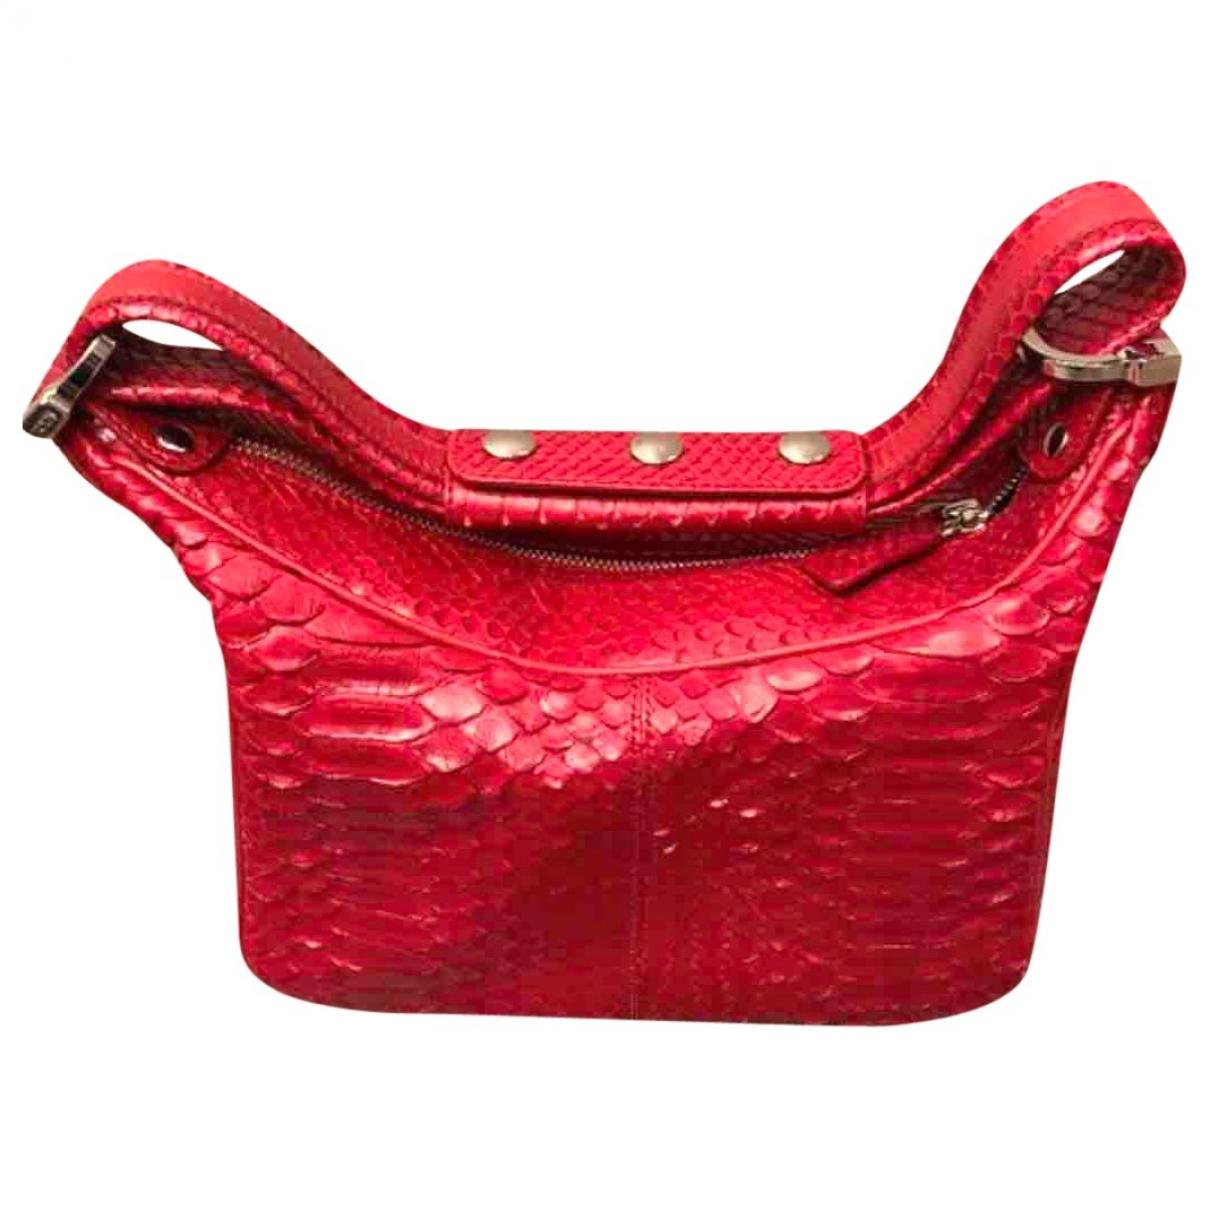 Tod's \N Red Python handbag for Women \N